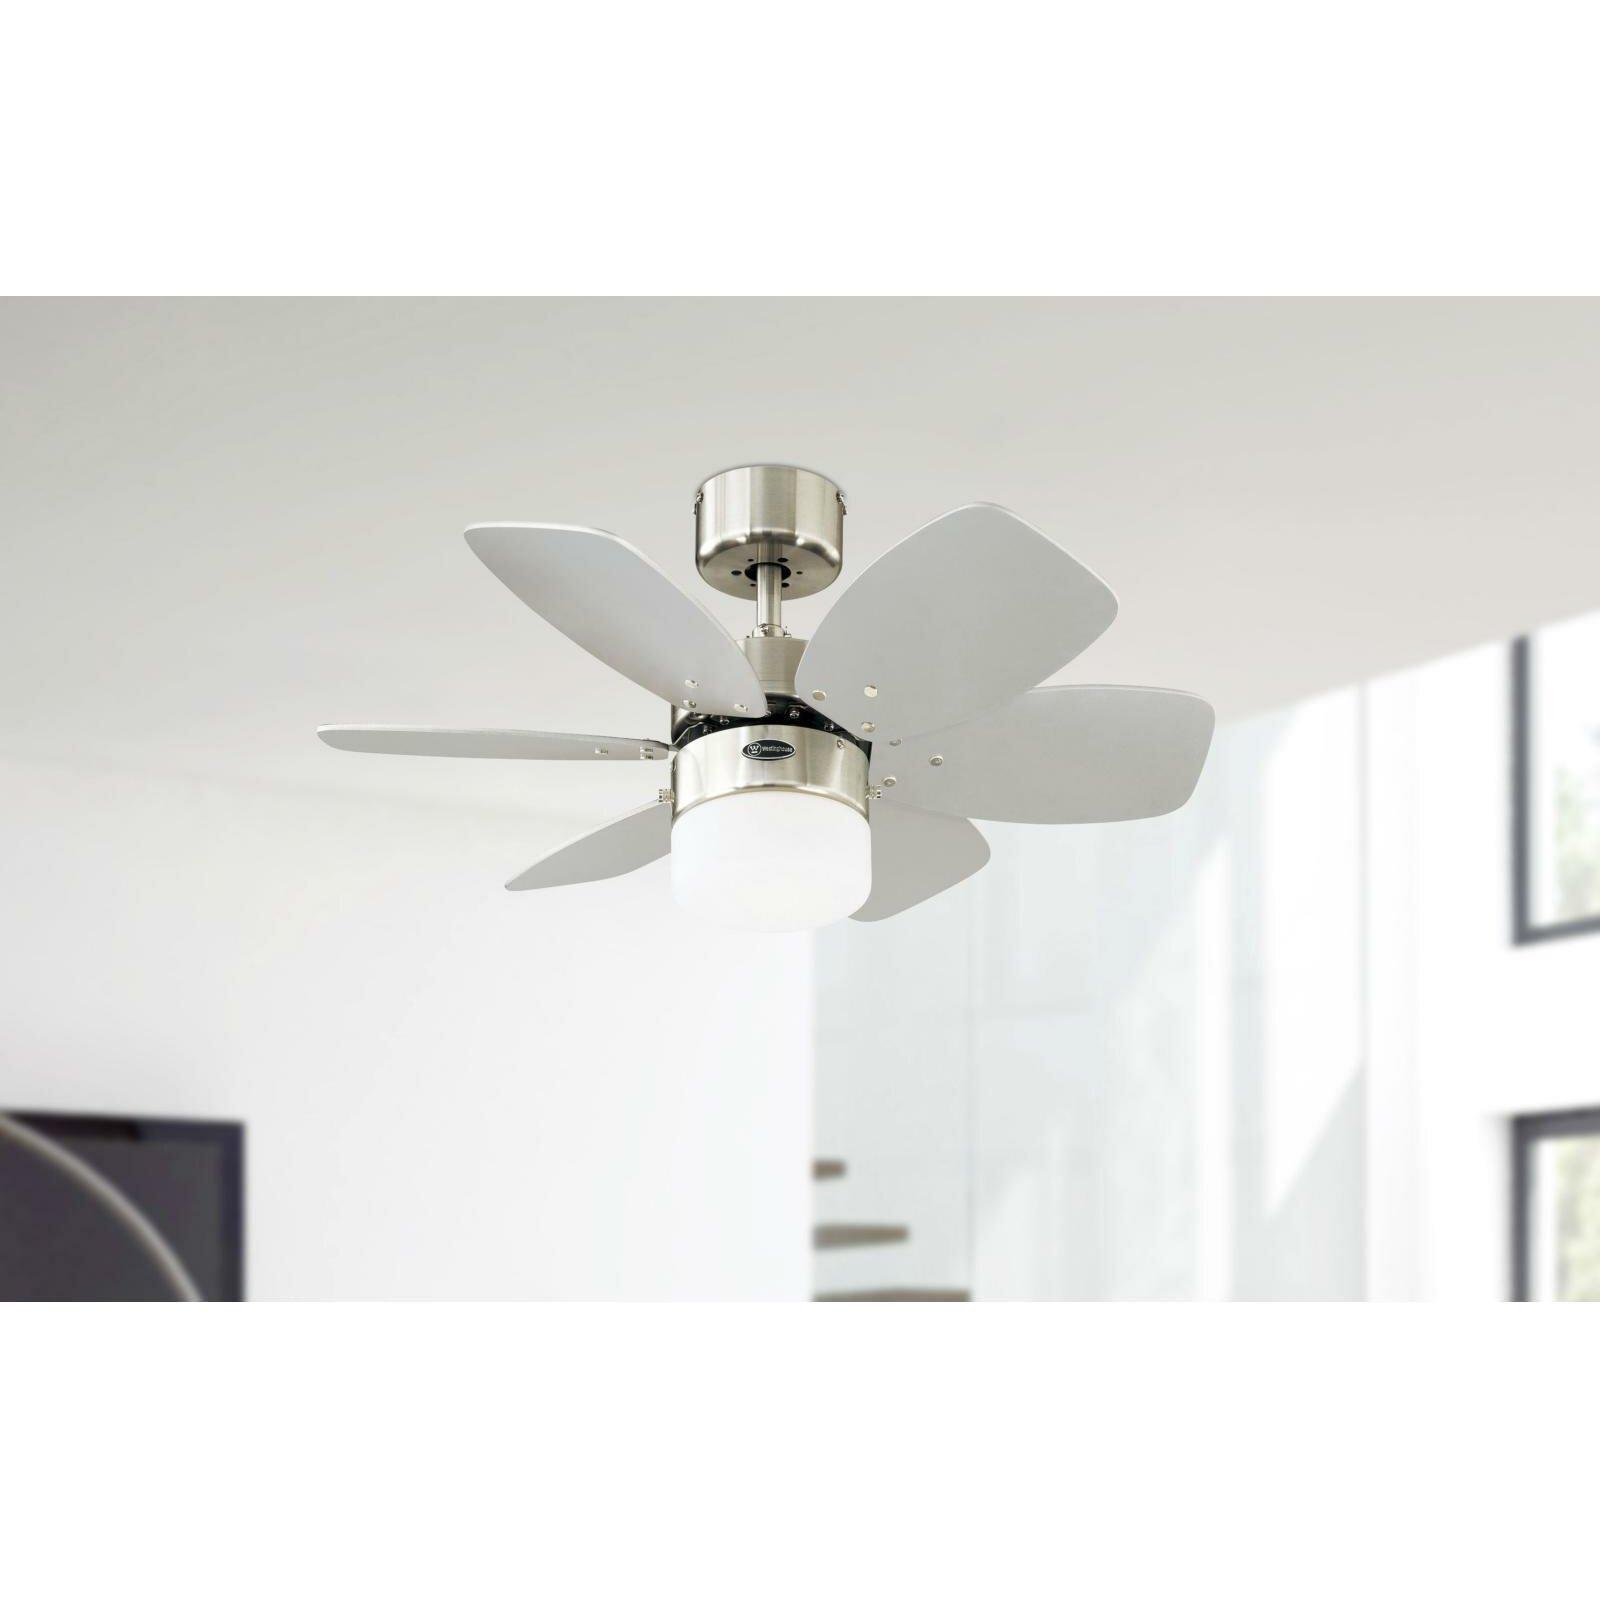 Westinghouse 76cm Floral Royal 6 Blade Ceiling Fan